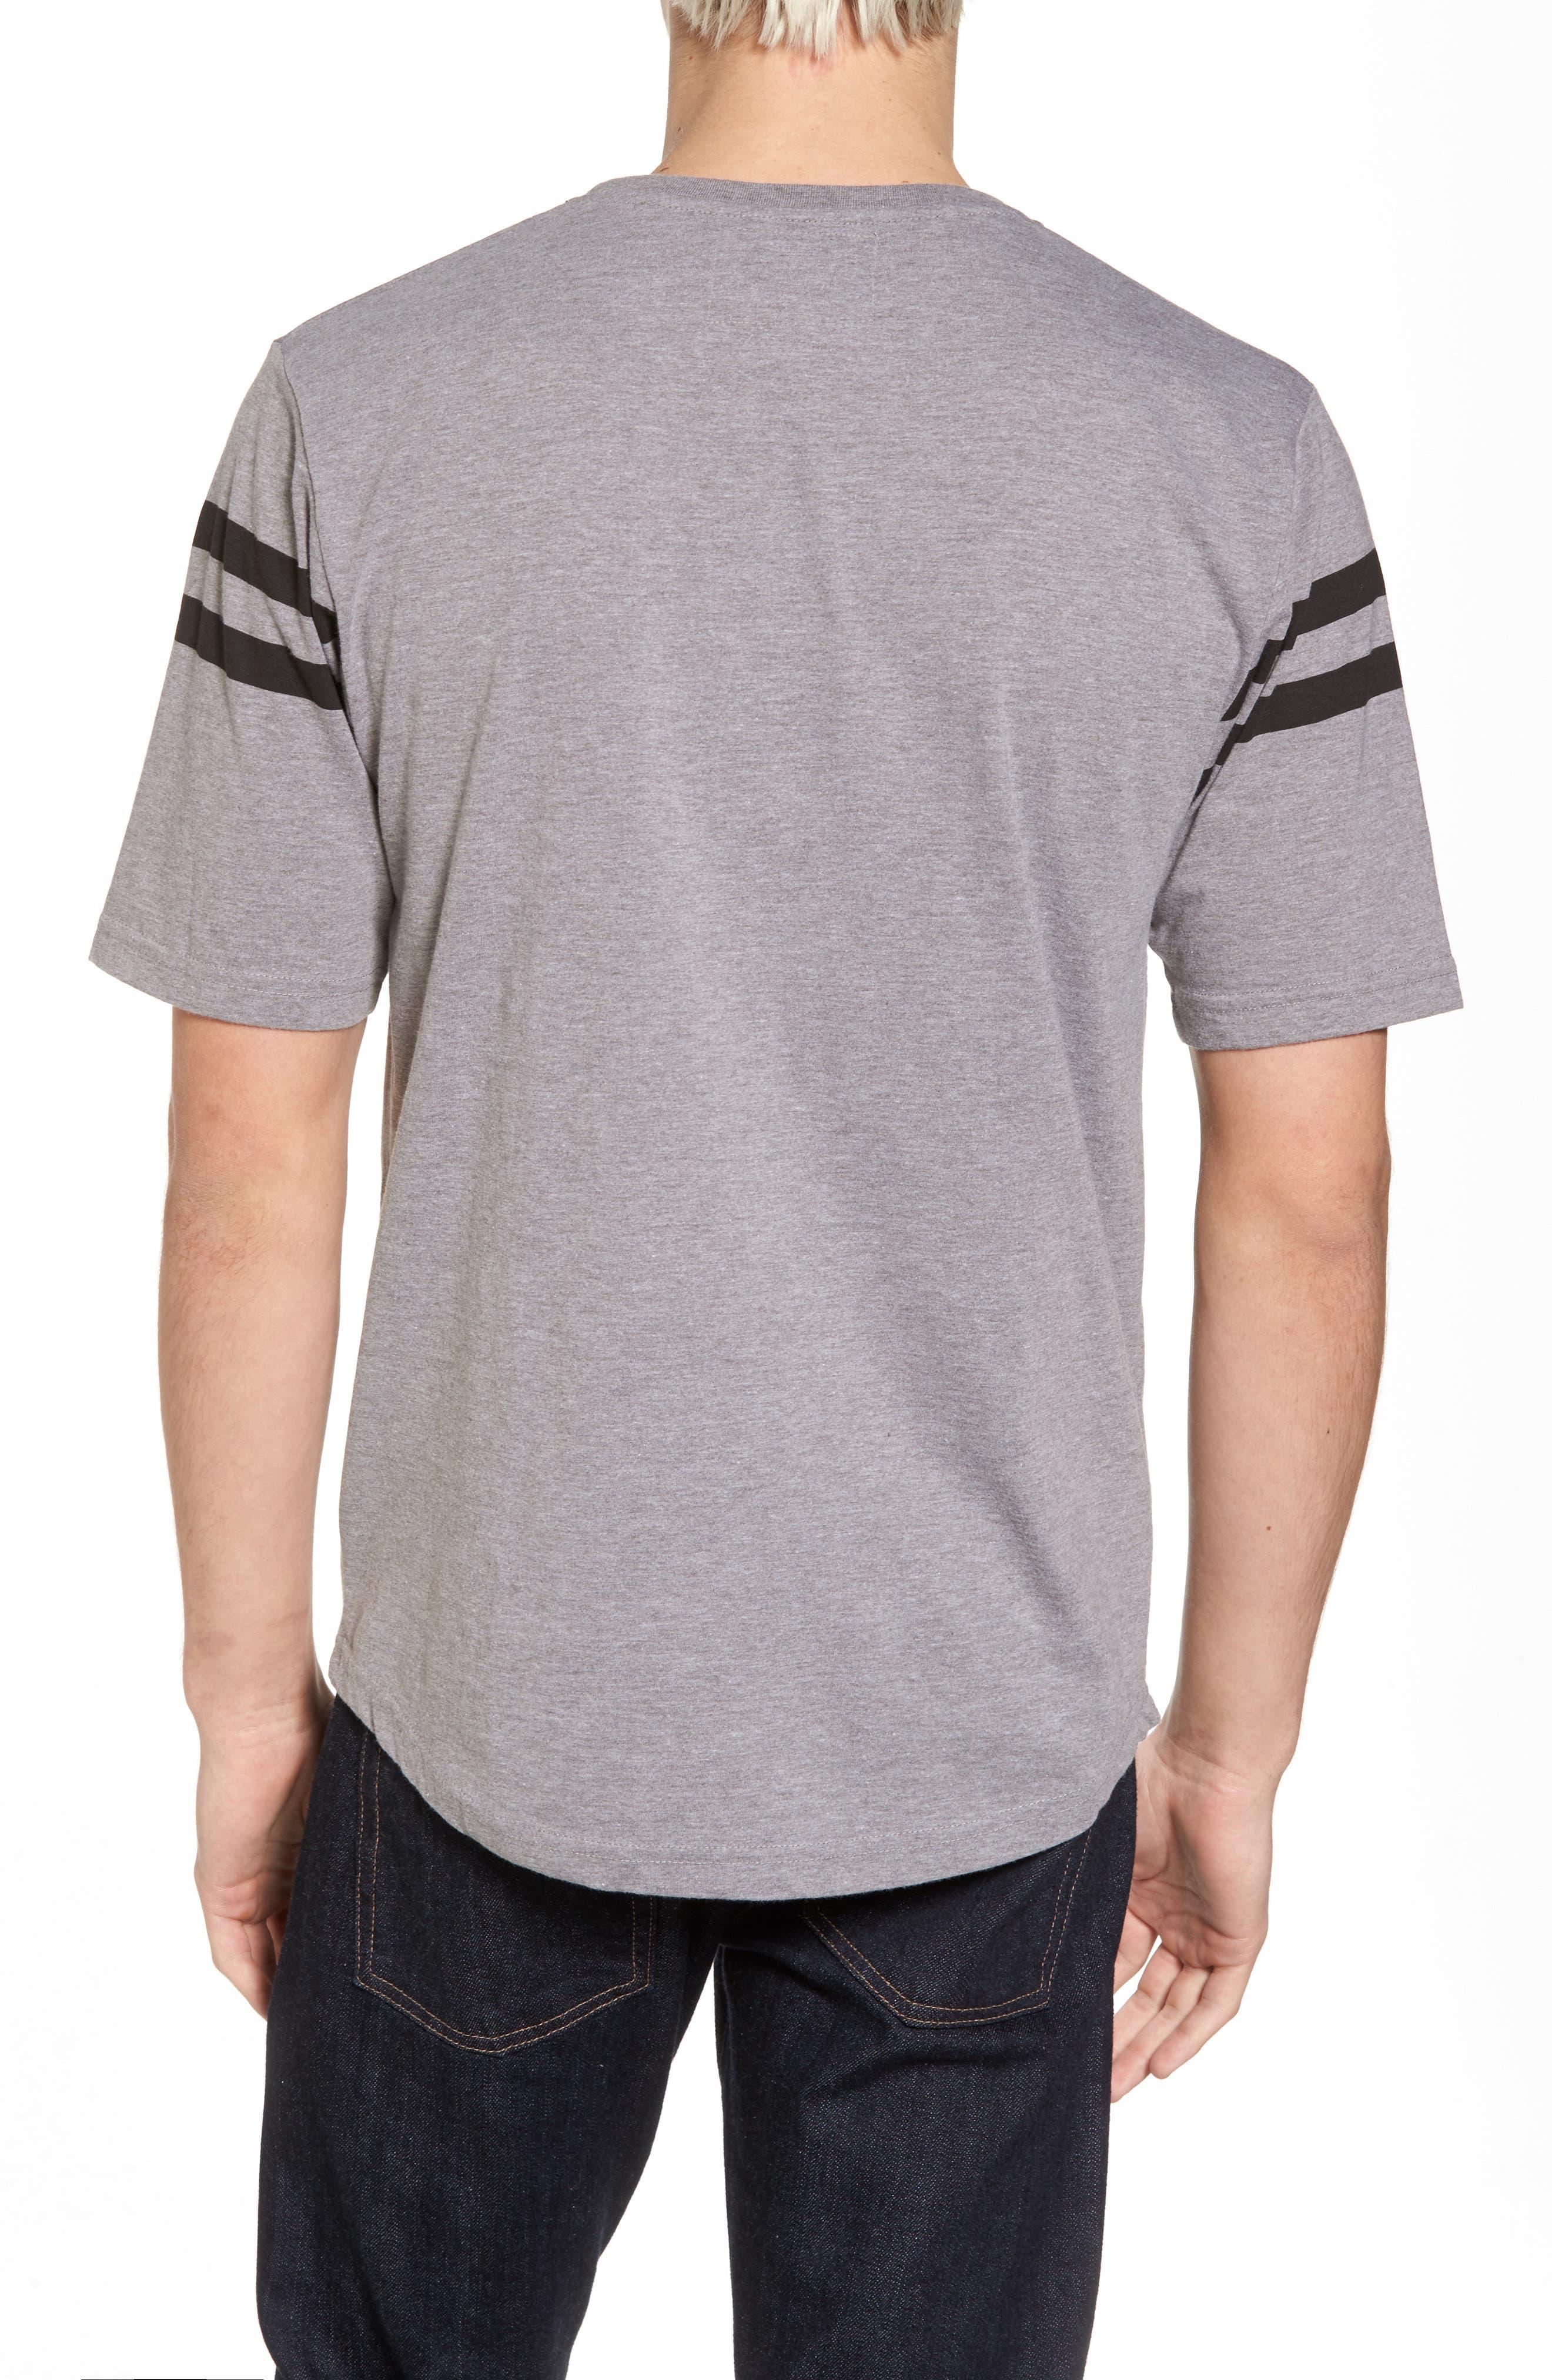 Crosby Boston Bruins T-Shirt,                             Alternate thumbnail 2, color,